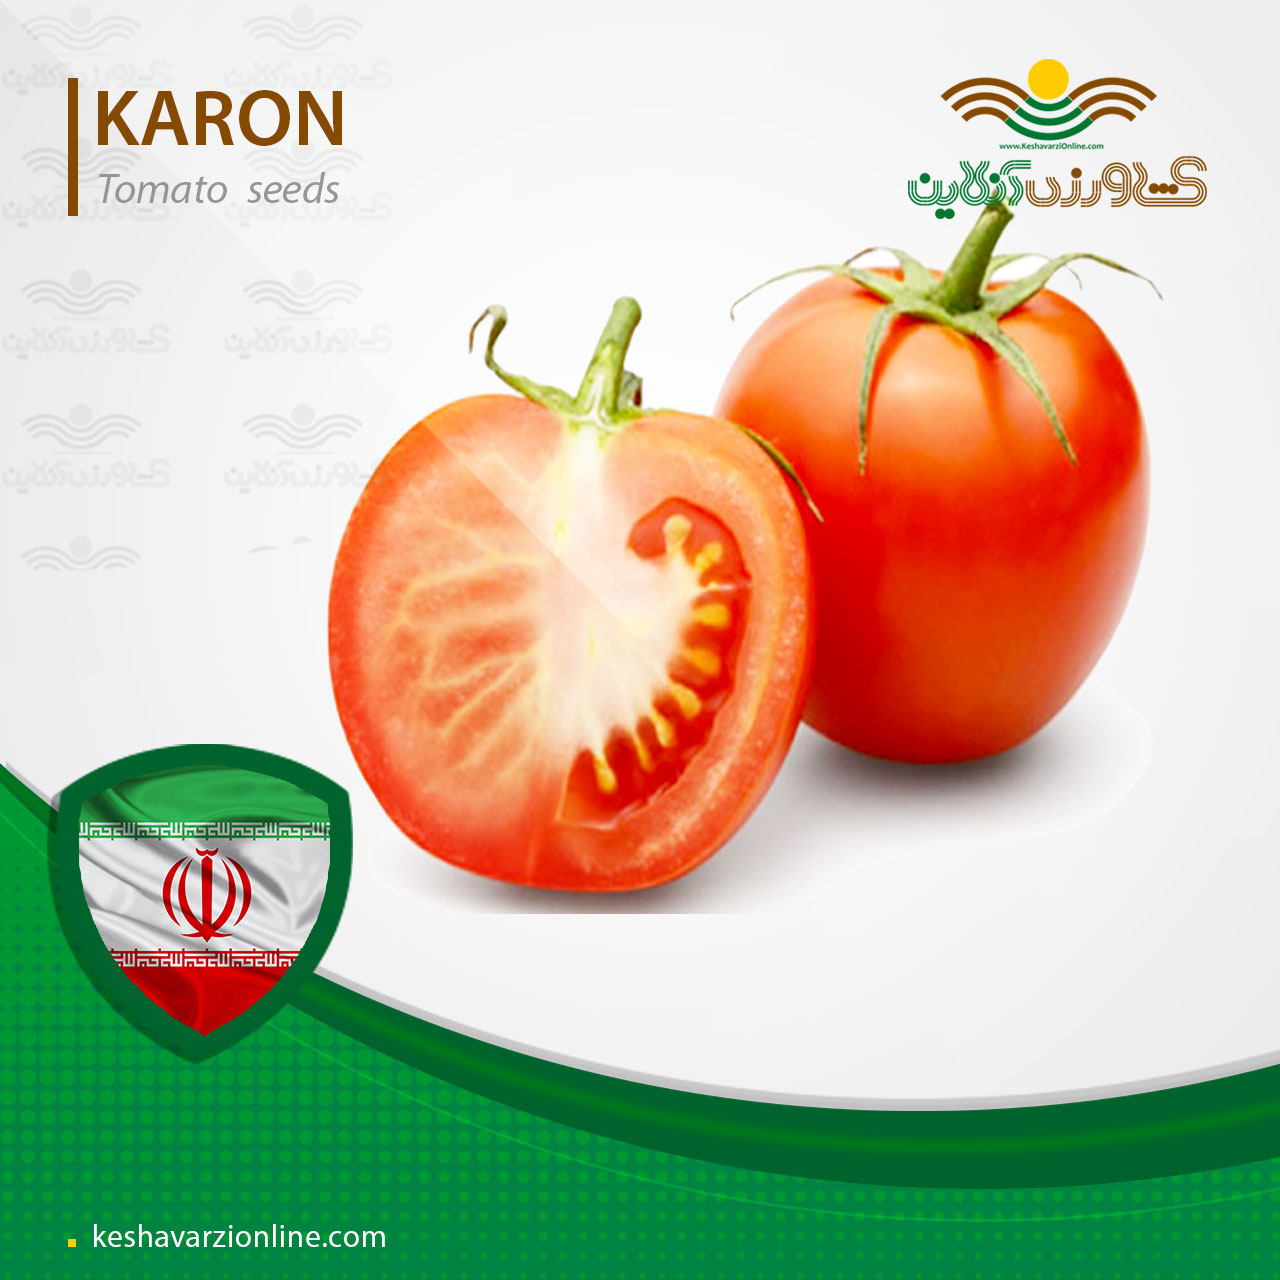 بذر گوجه فرنگی فلات کارون